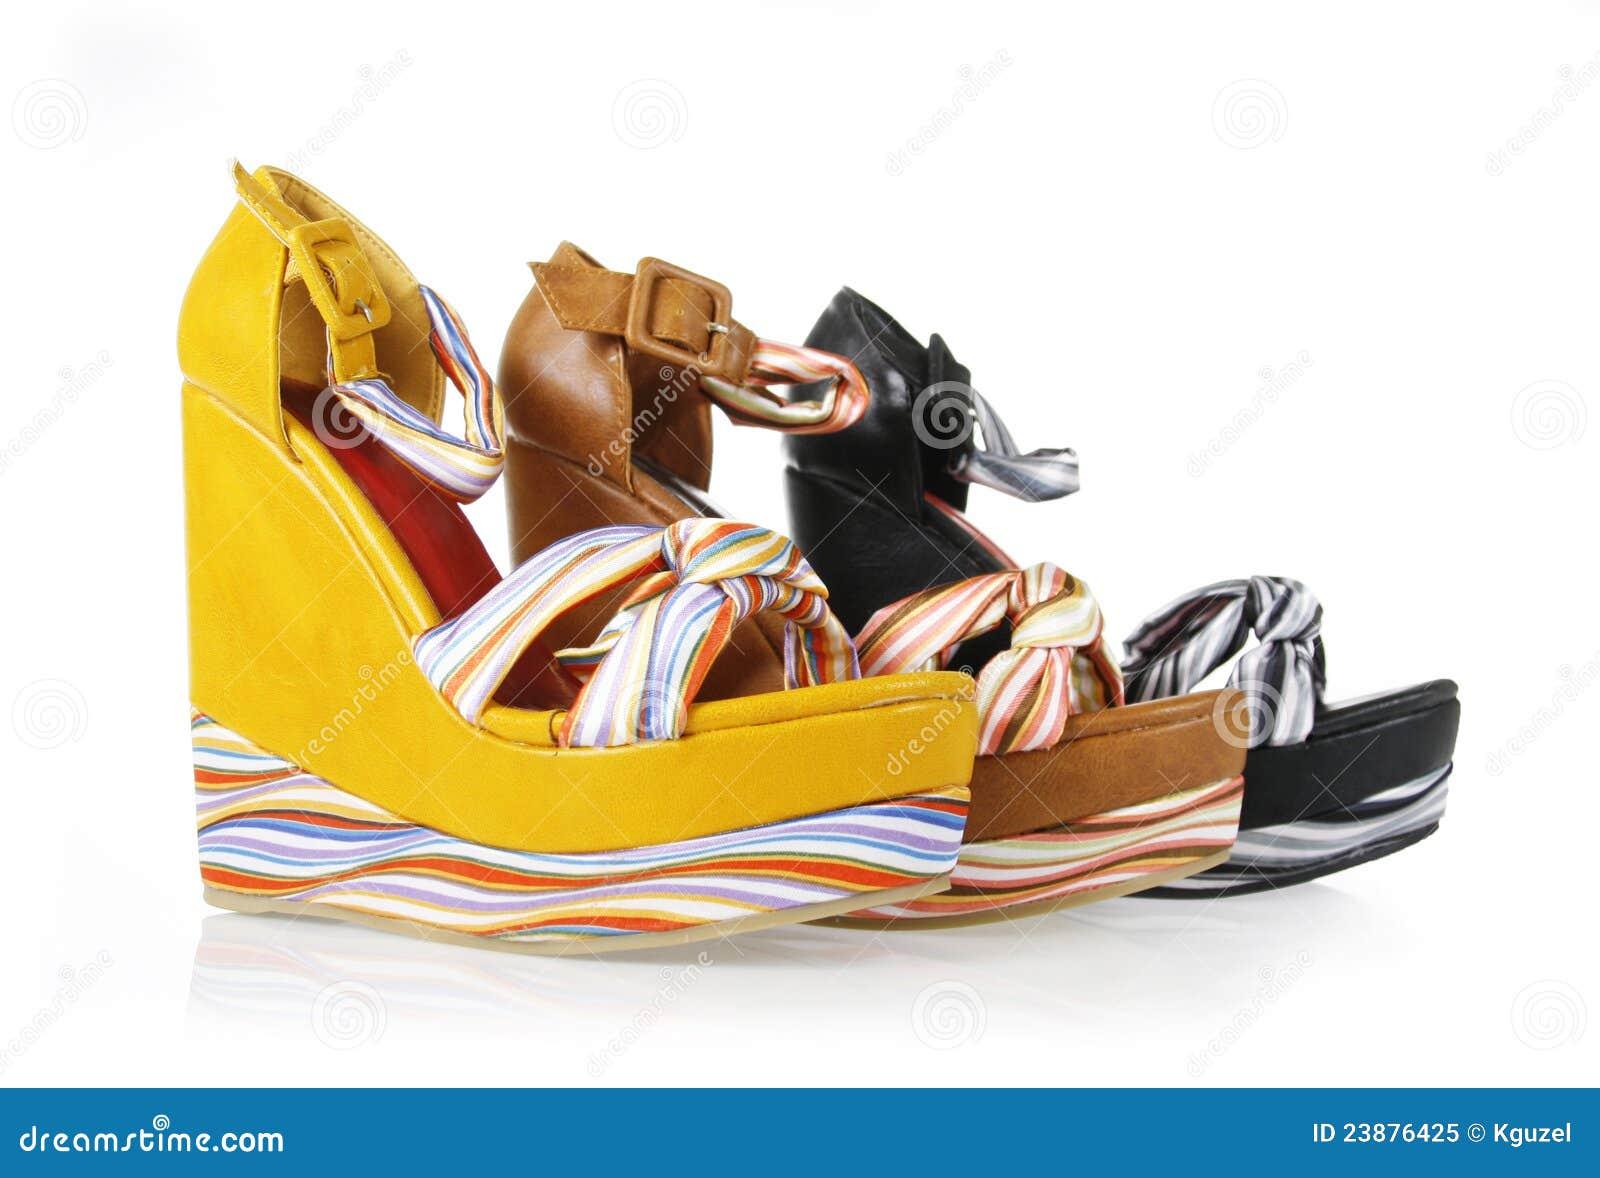 Pattern platform shoes collection